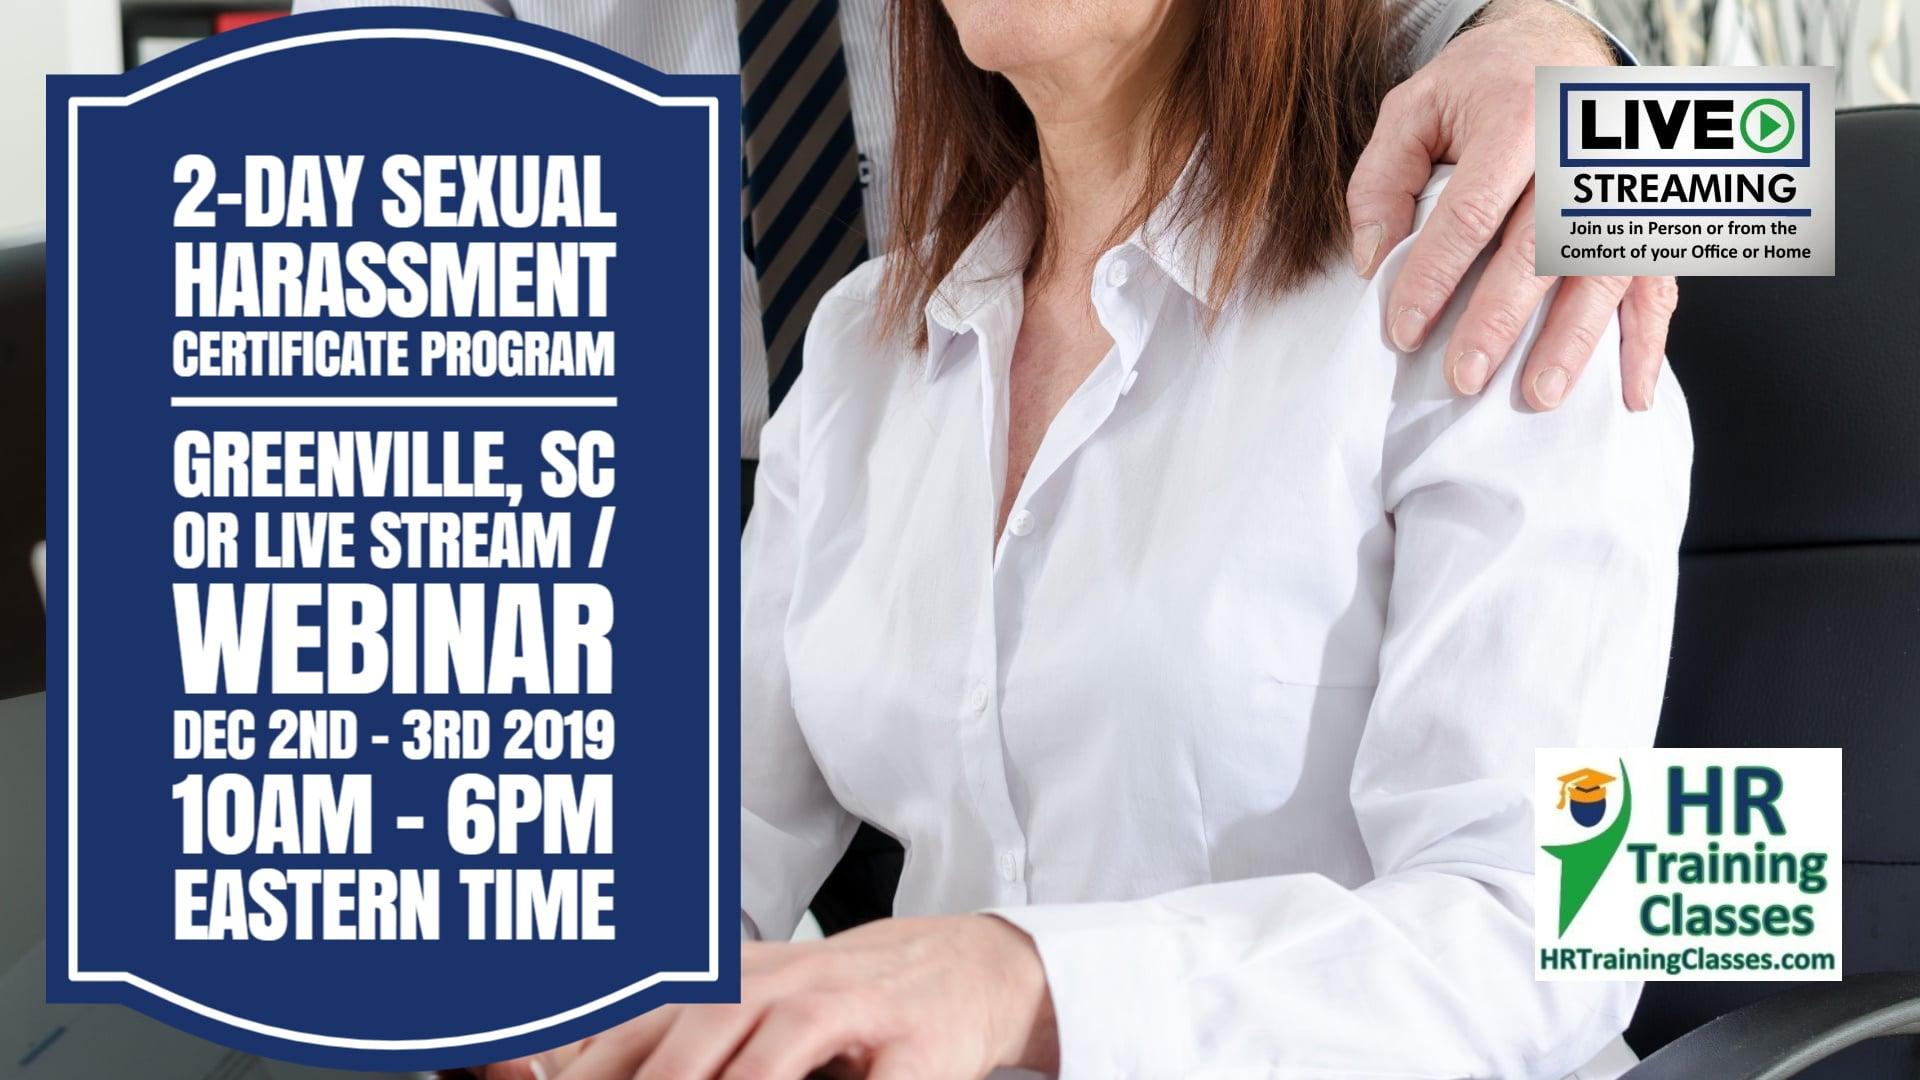 2 Day Sexual Harassment Certificate Program with Elga Lejarza-Penn in Greenville SC or join us online via Live Stream Webinar! Starting December 2 2019